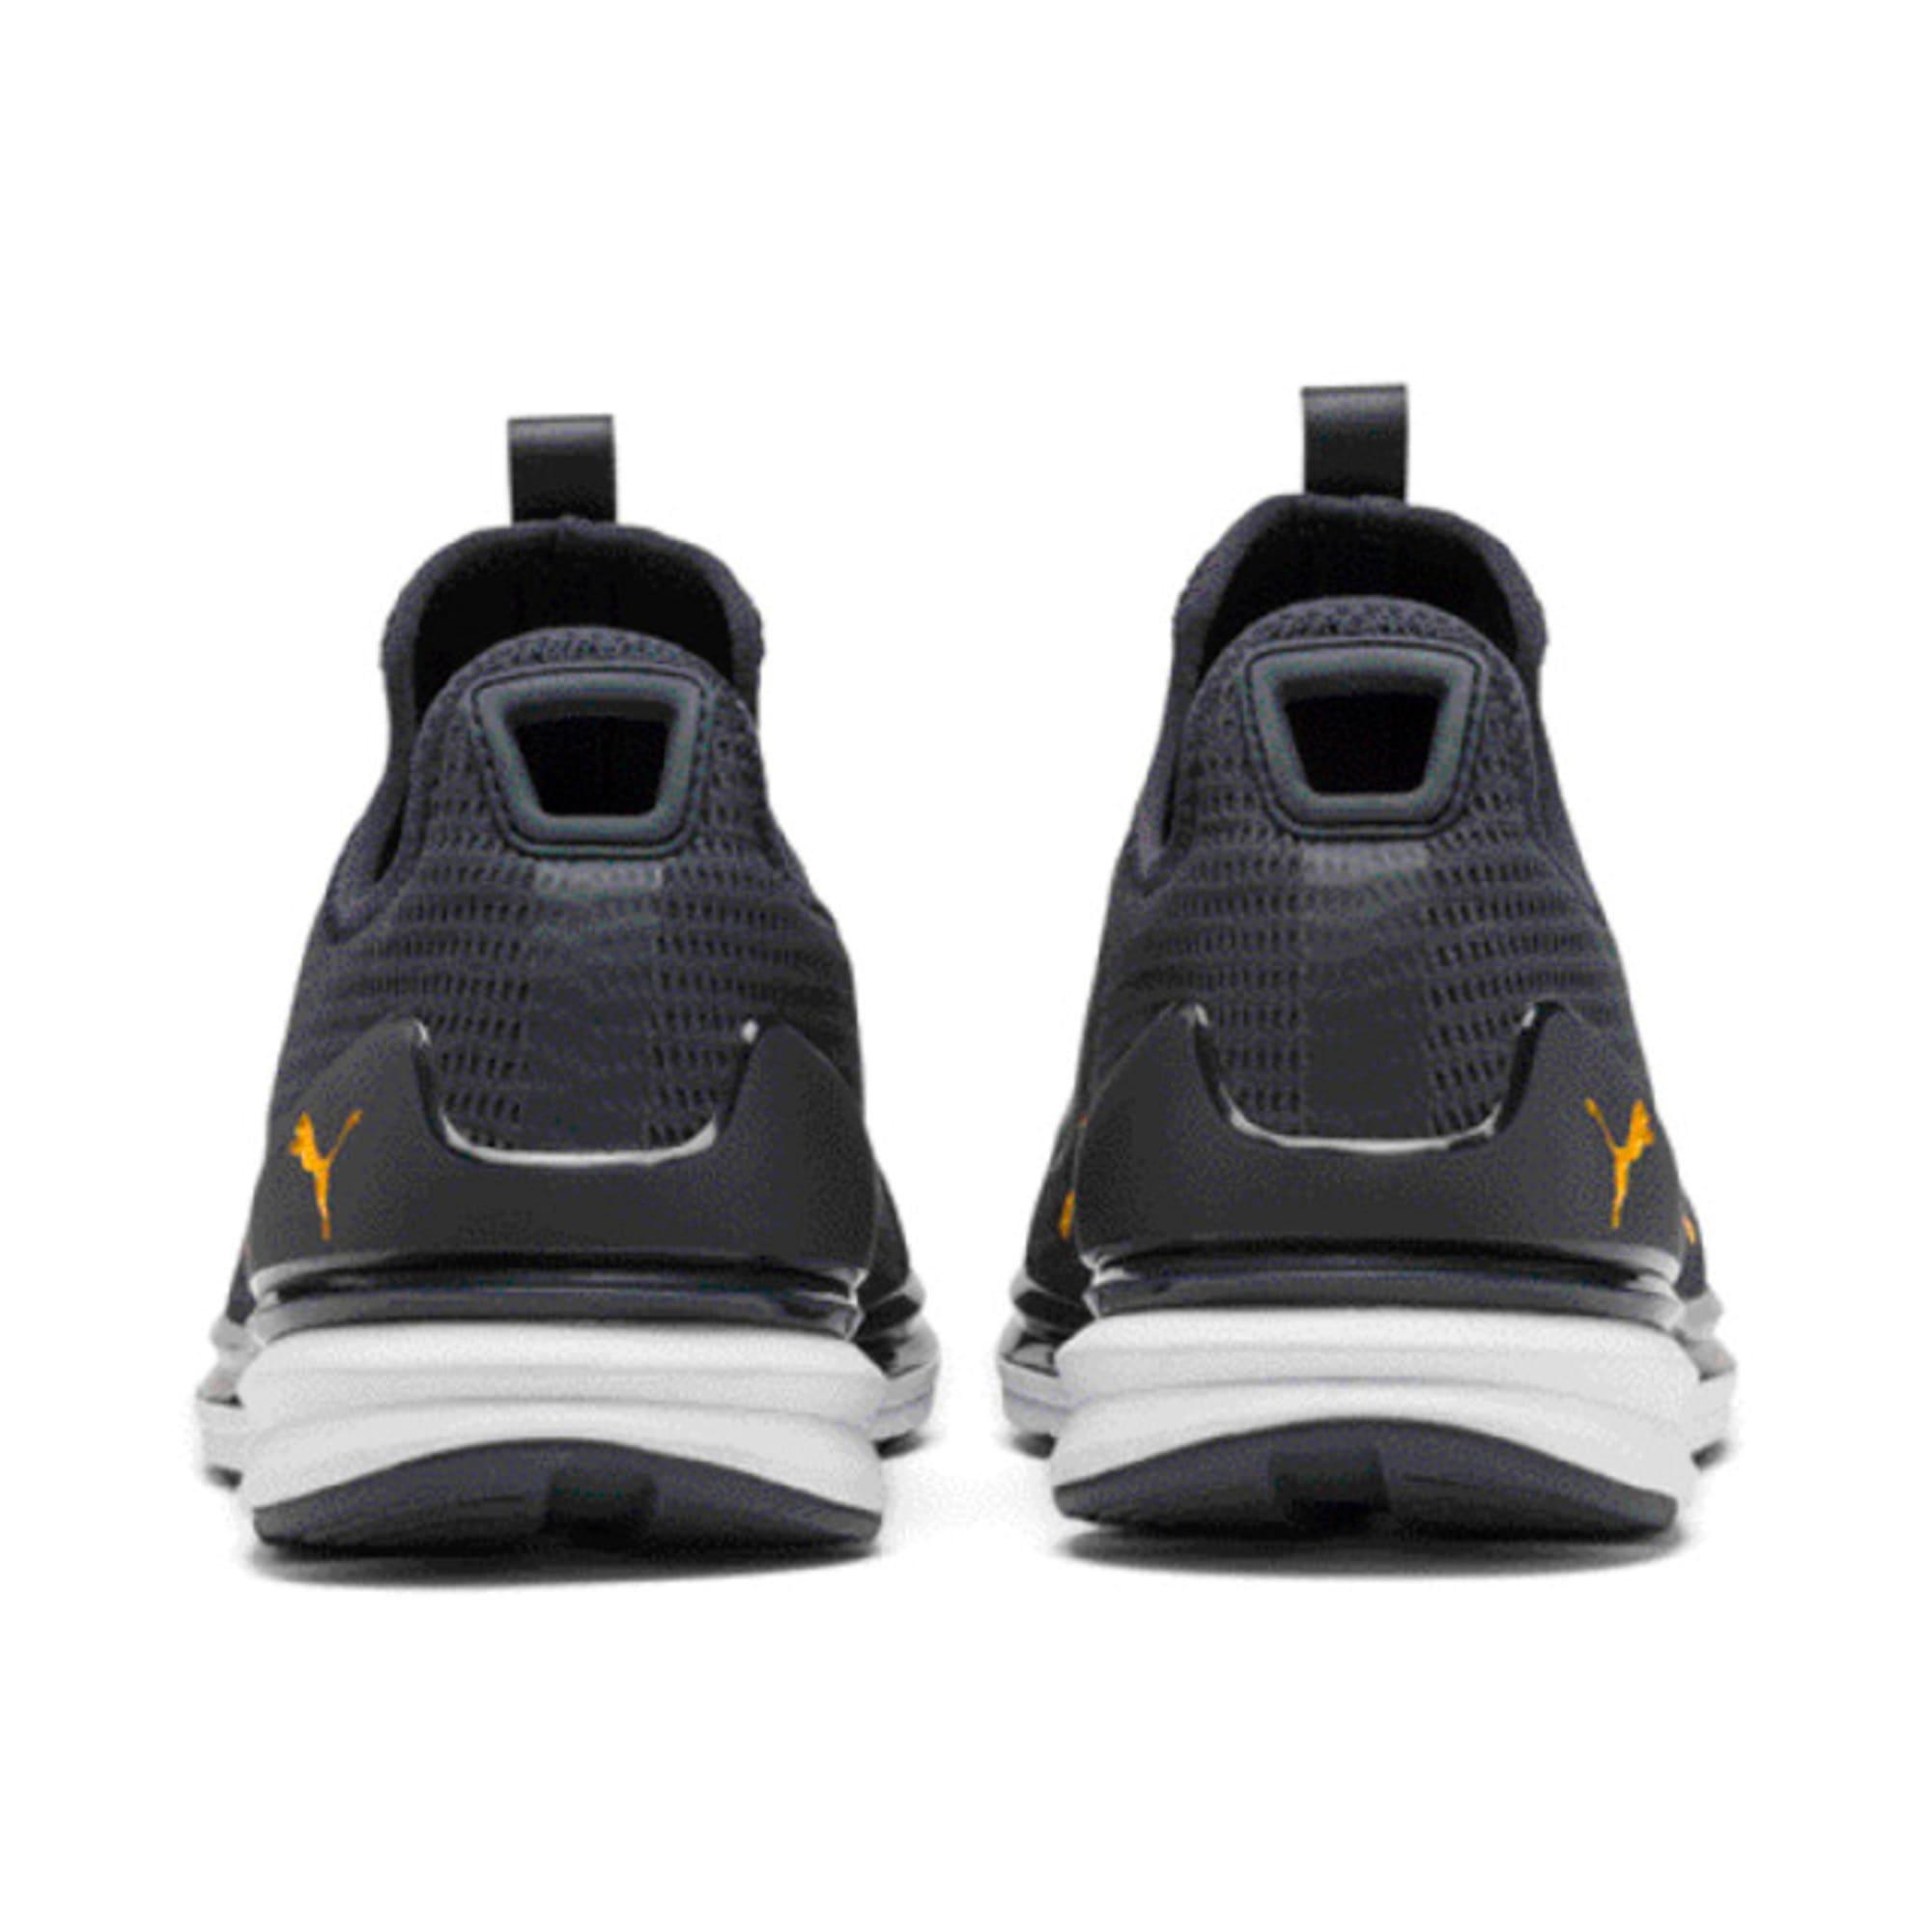 Thumbnail 6 of IGNITE Limitless Lean Running Shoes, Peacoat-Orange Alert, medium-IND